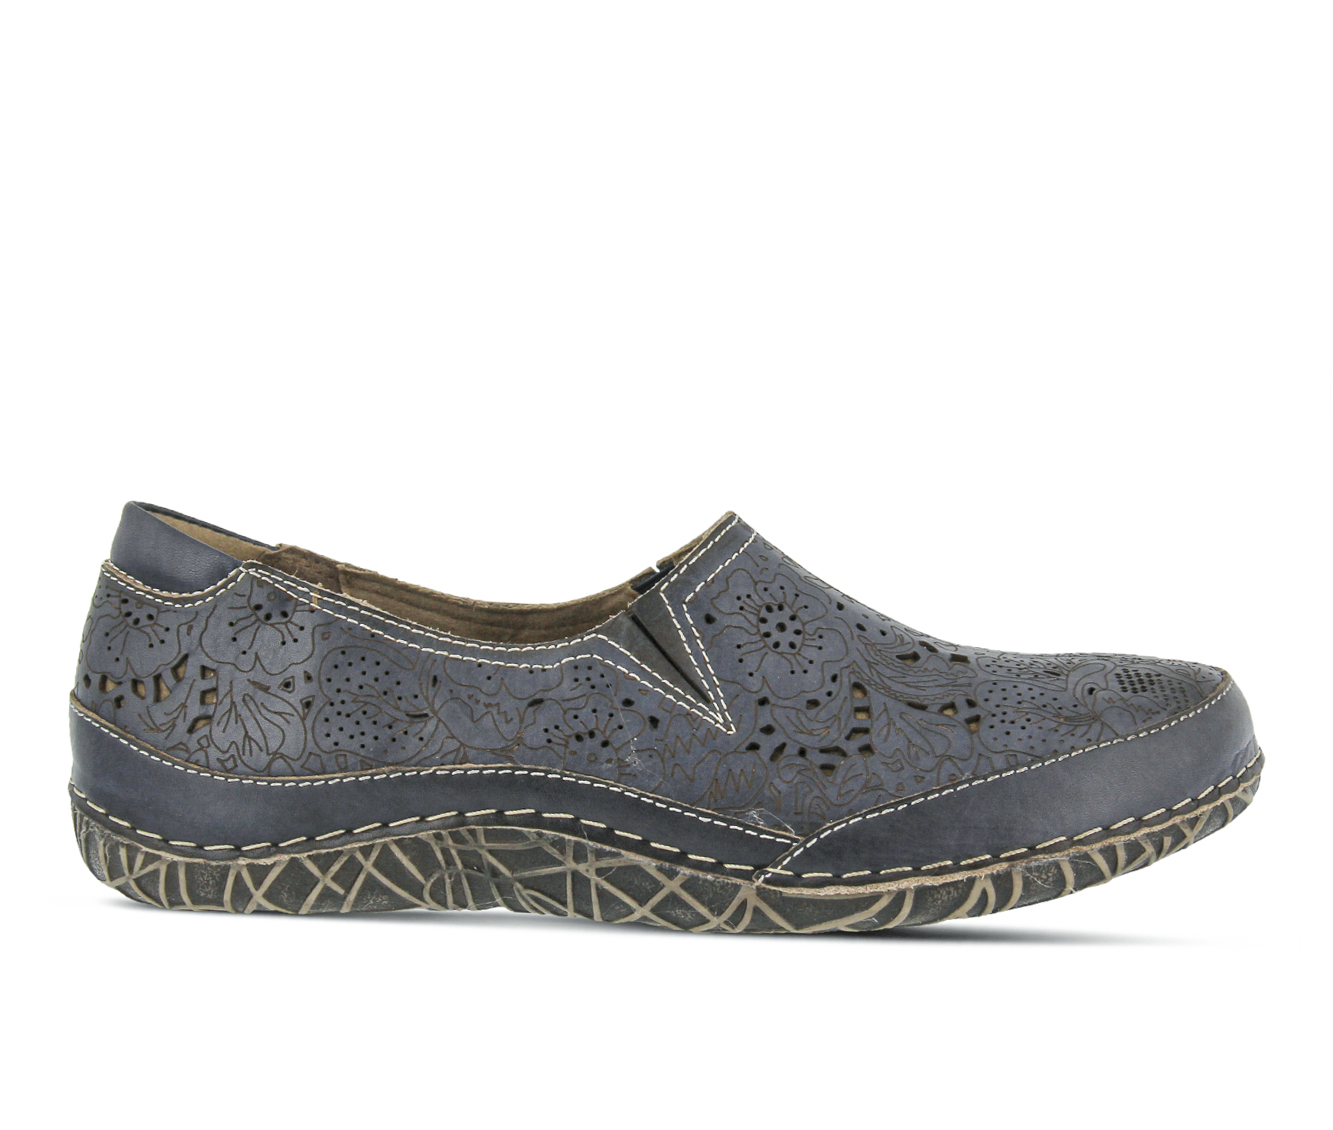 L'Artiste Libora Women's Shoe (Blue Leather)